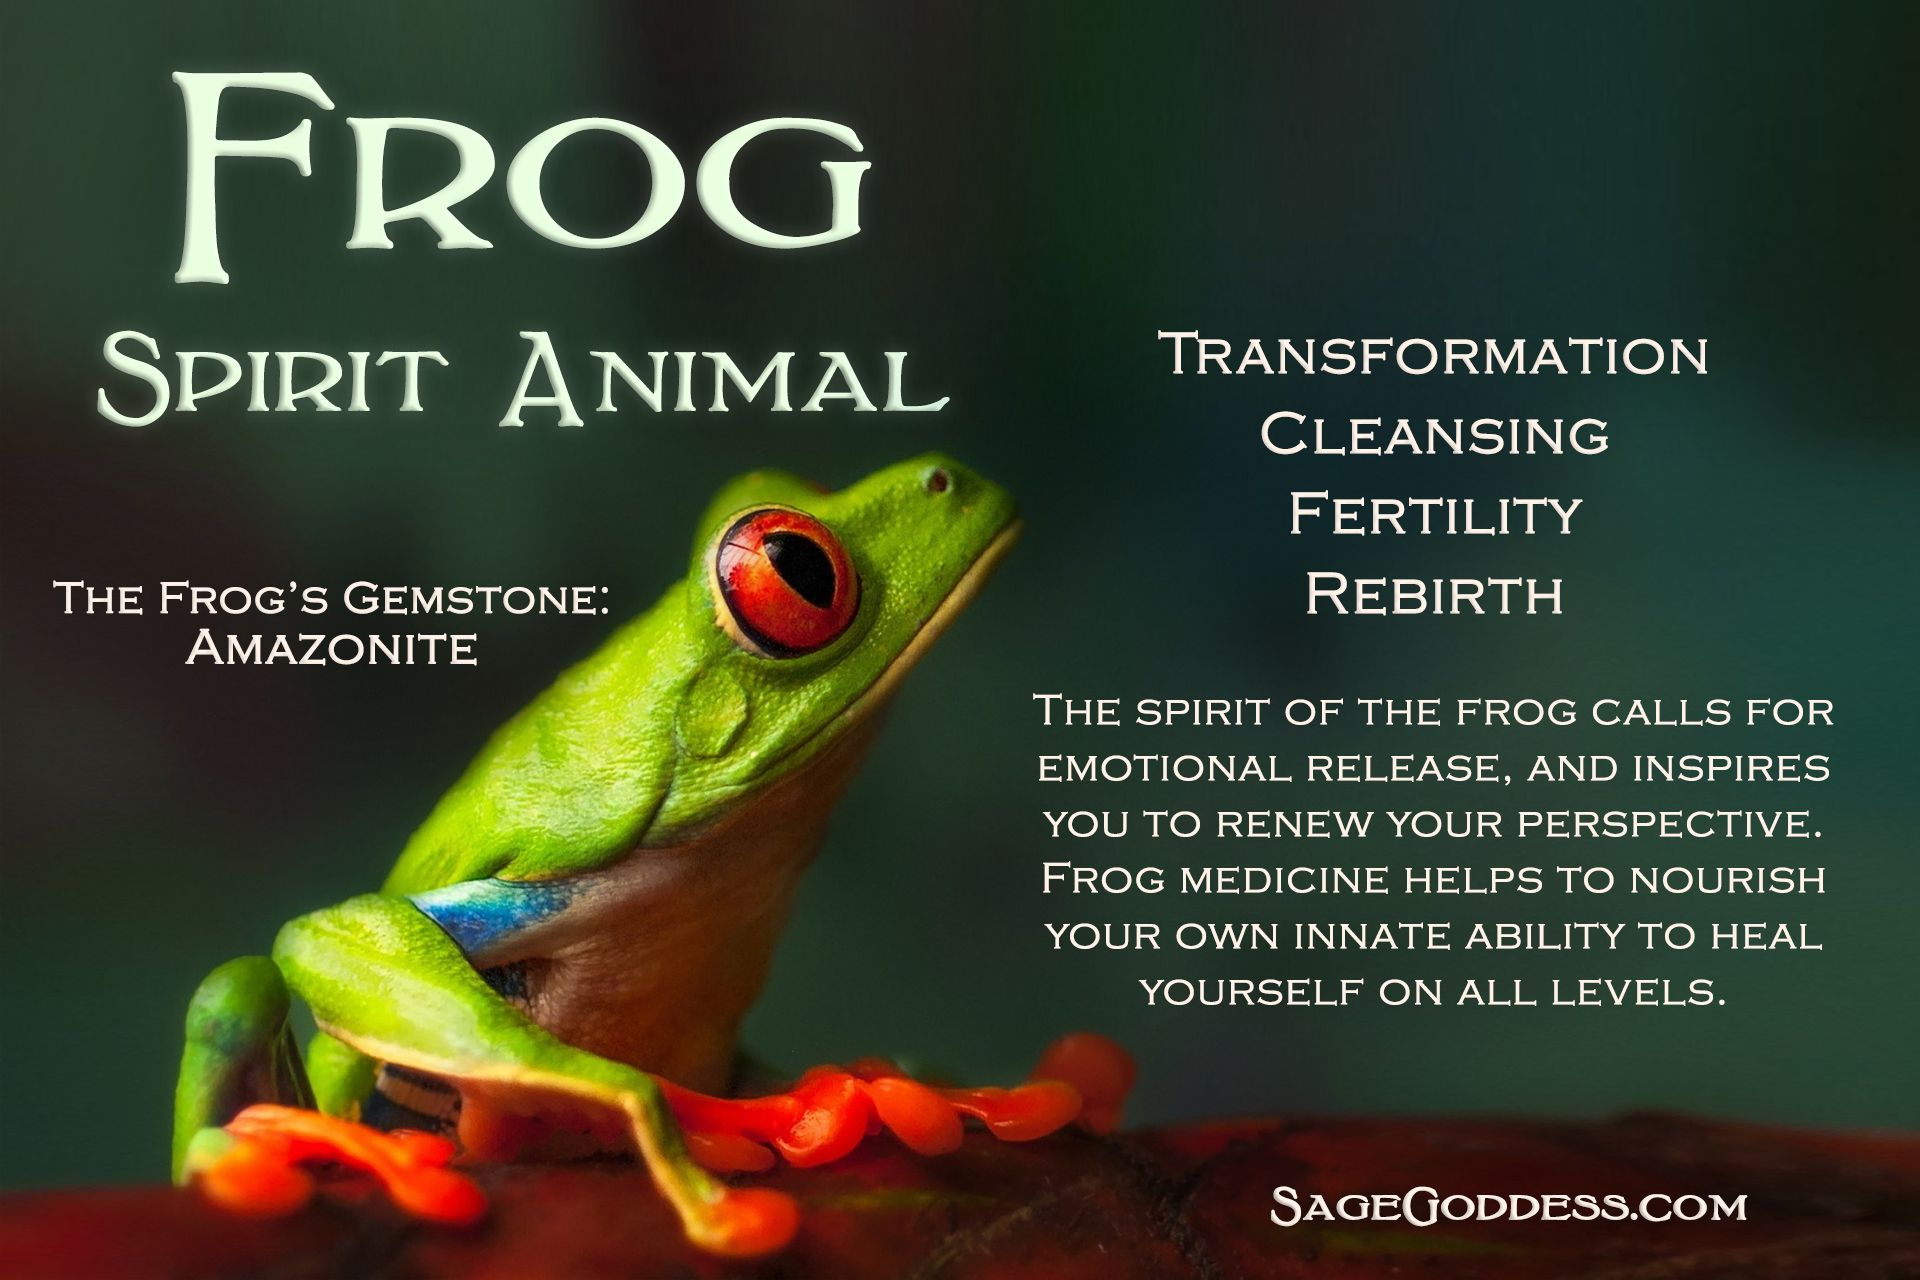 frog spirit guide outside the lines animales de poder animales runas. Black Bedroom Furniture Sets. Home Design Ideas